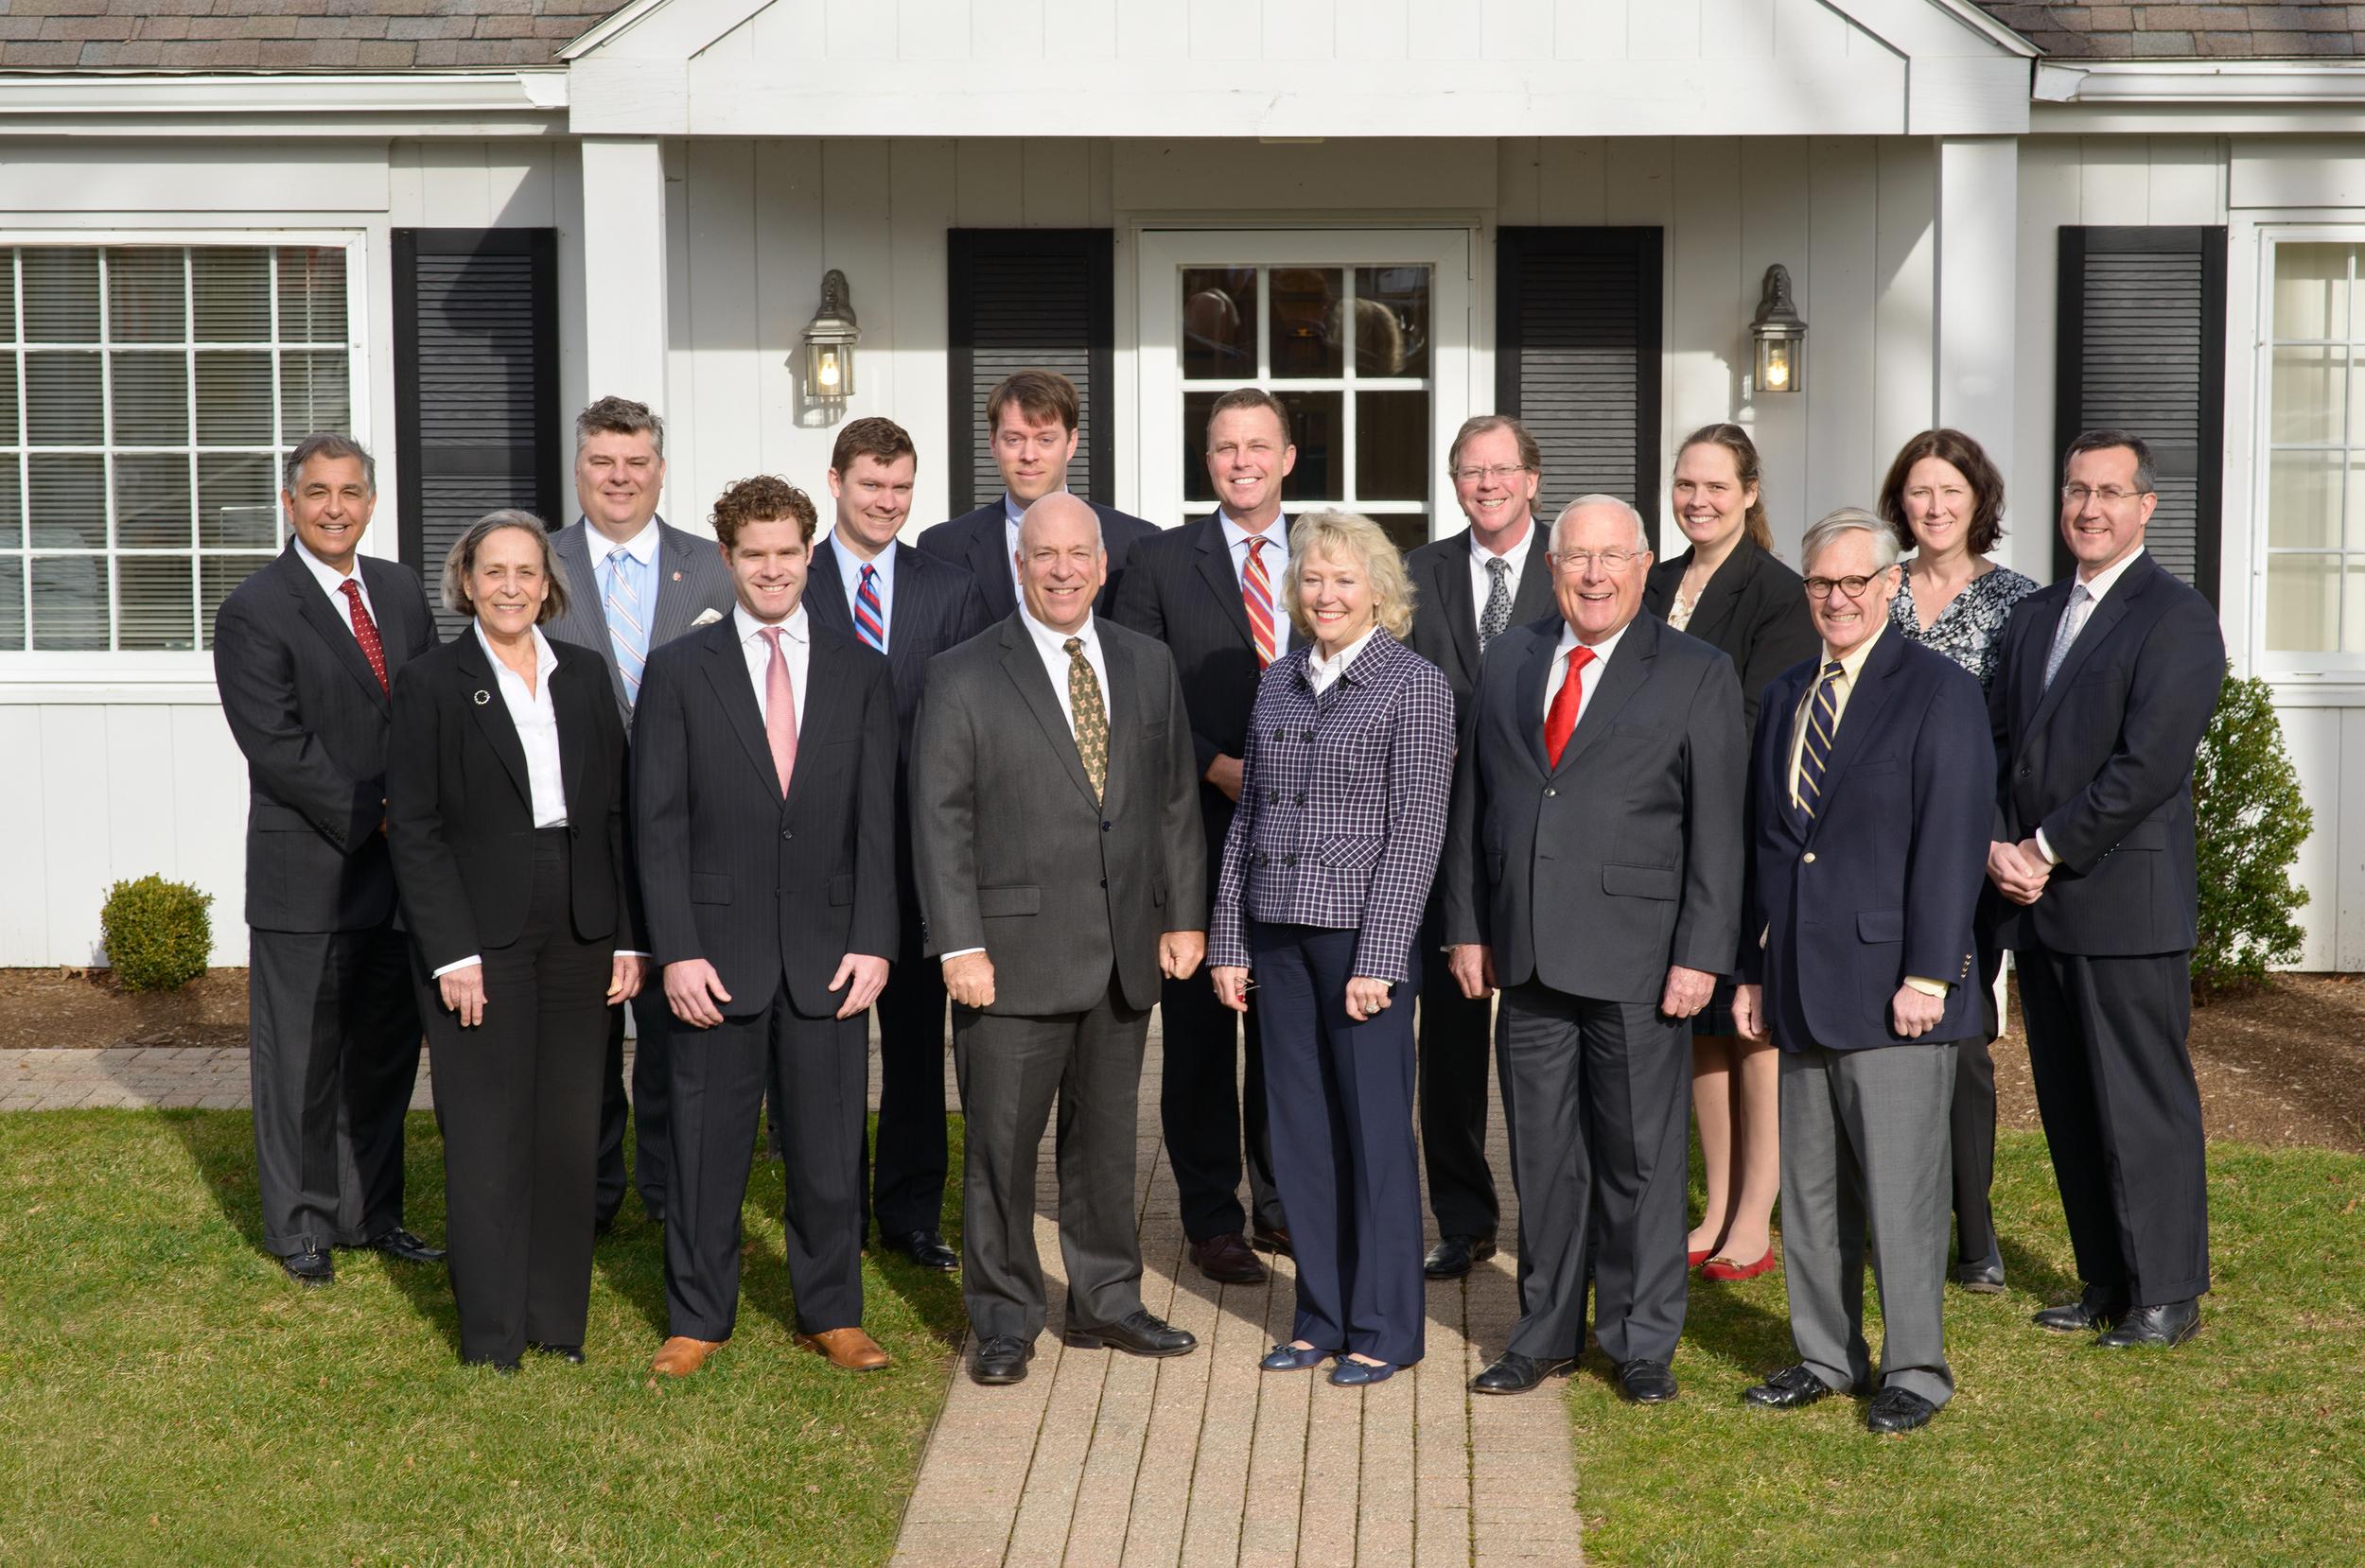 Morgan Stanley group portrait